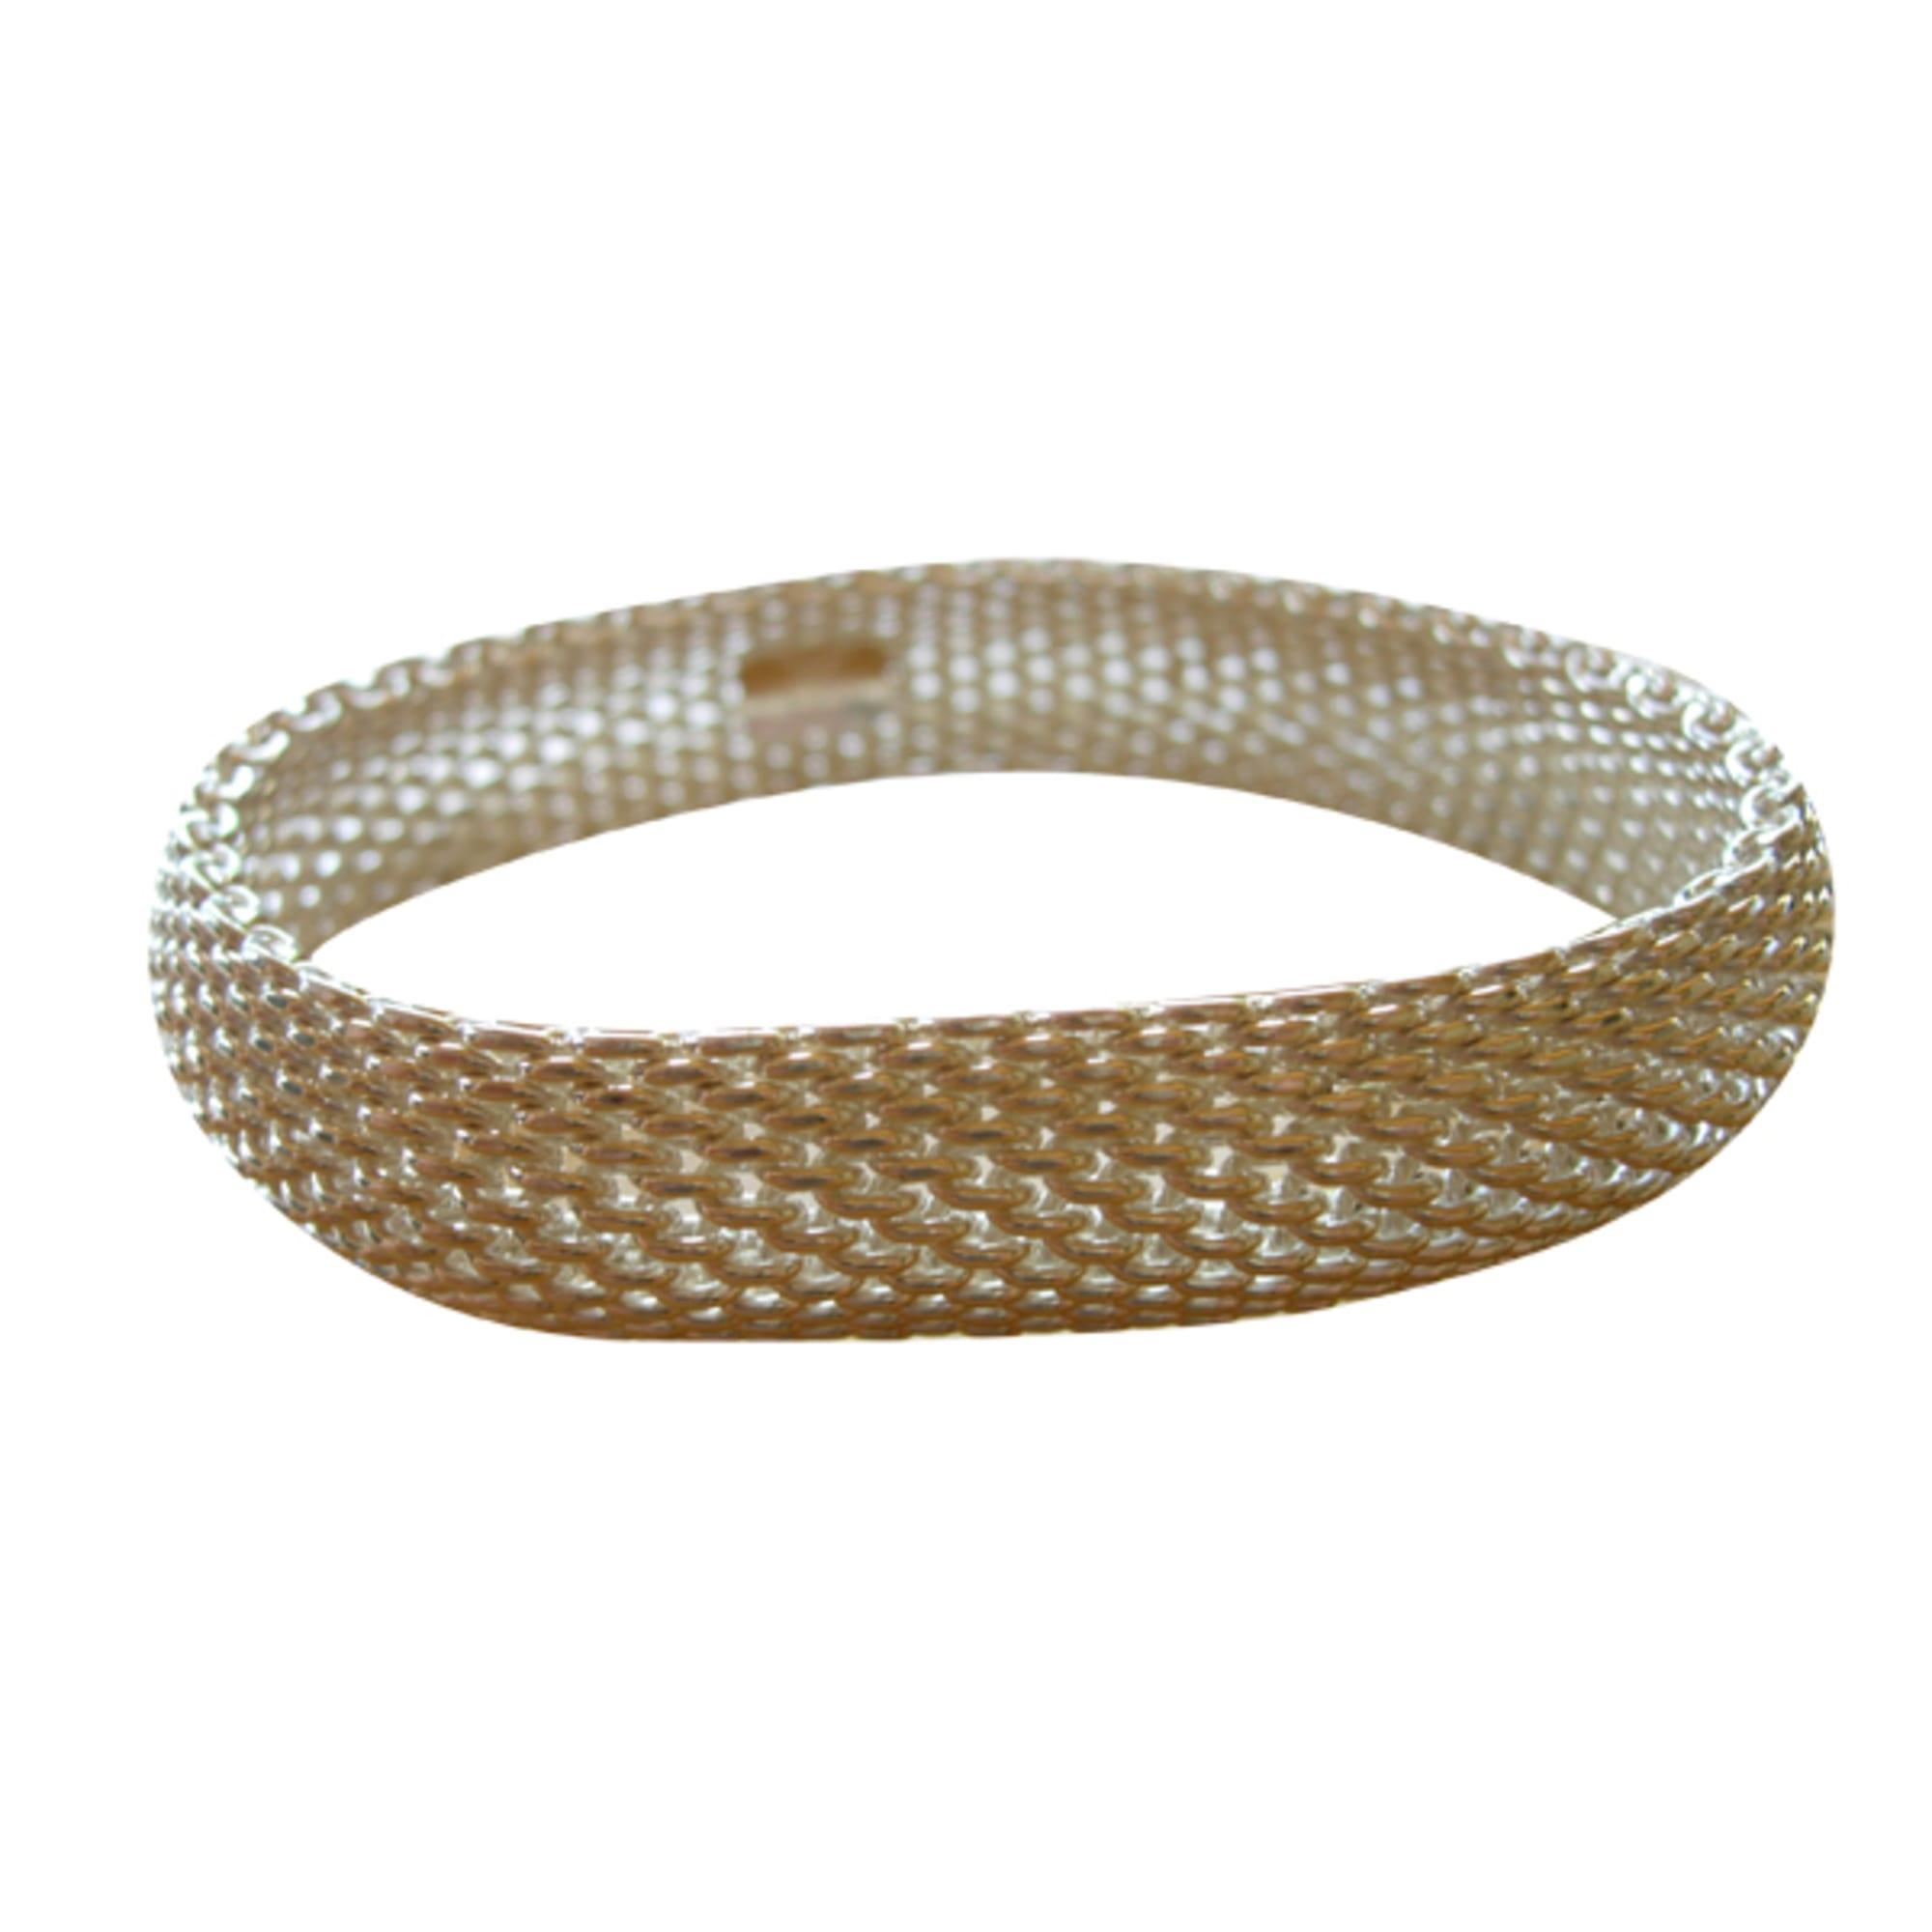 48f8c60f6 Bracelet TIFFANY & CO. argenté vendu par J'aimetiffany - 1524722